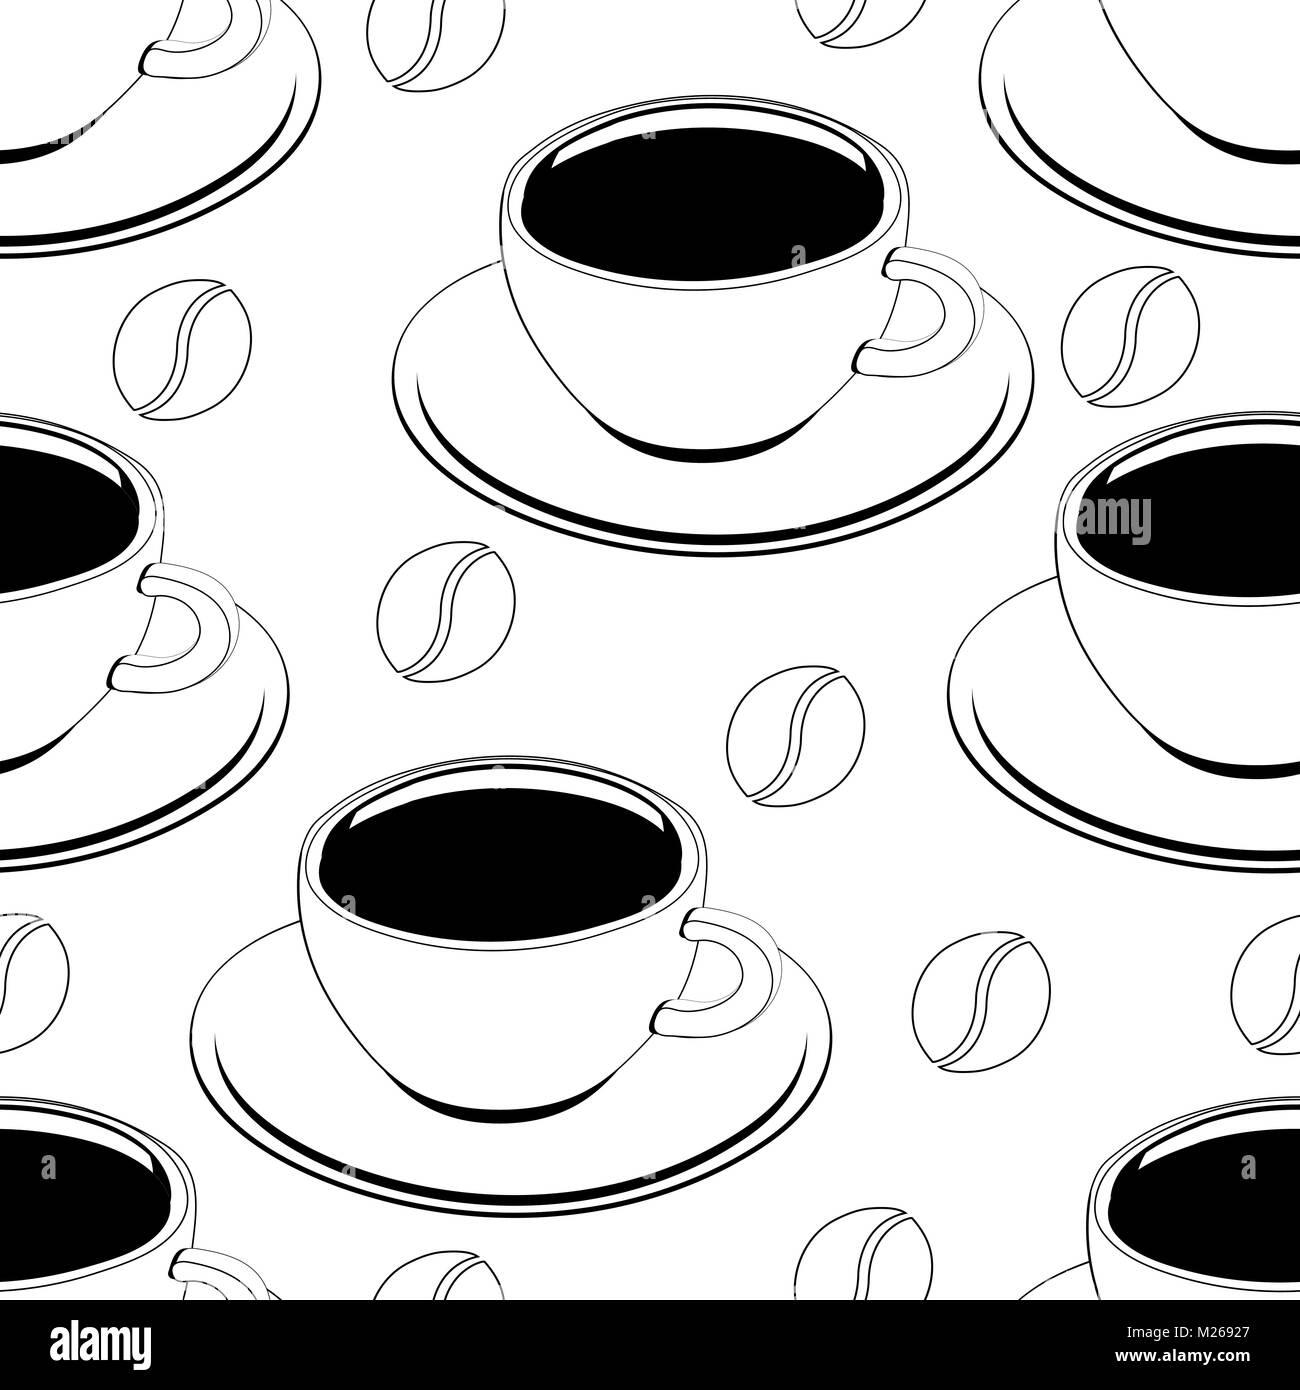 La taza de caf perfecta esquema patr n vector la for Papel tapiz de patron para el pasillo